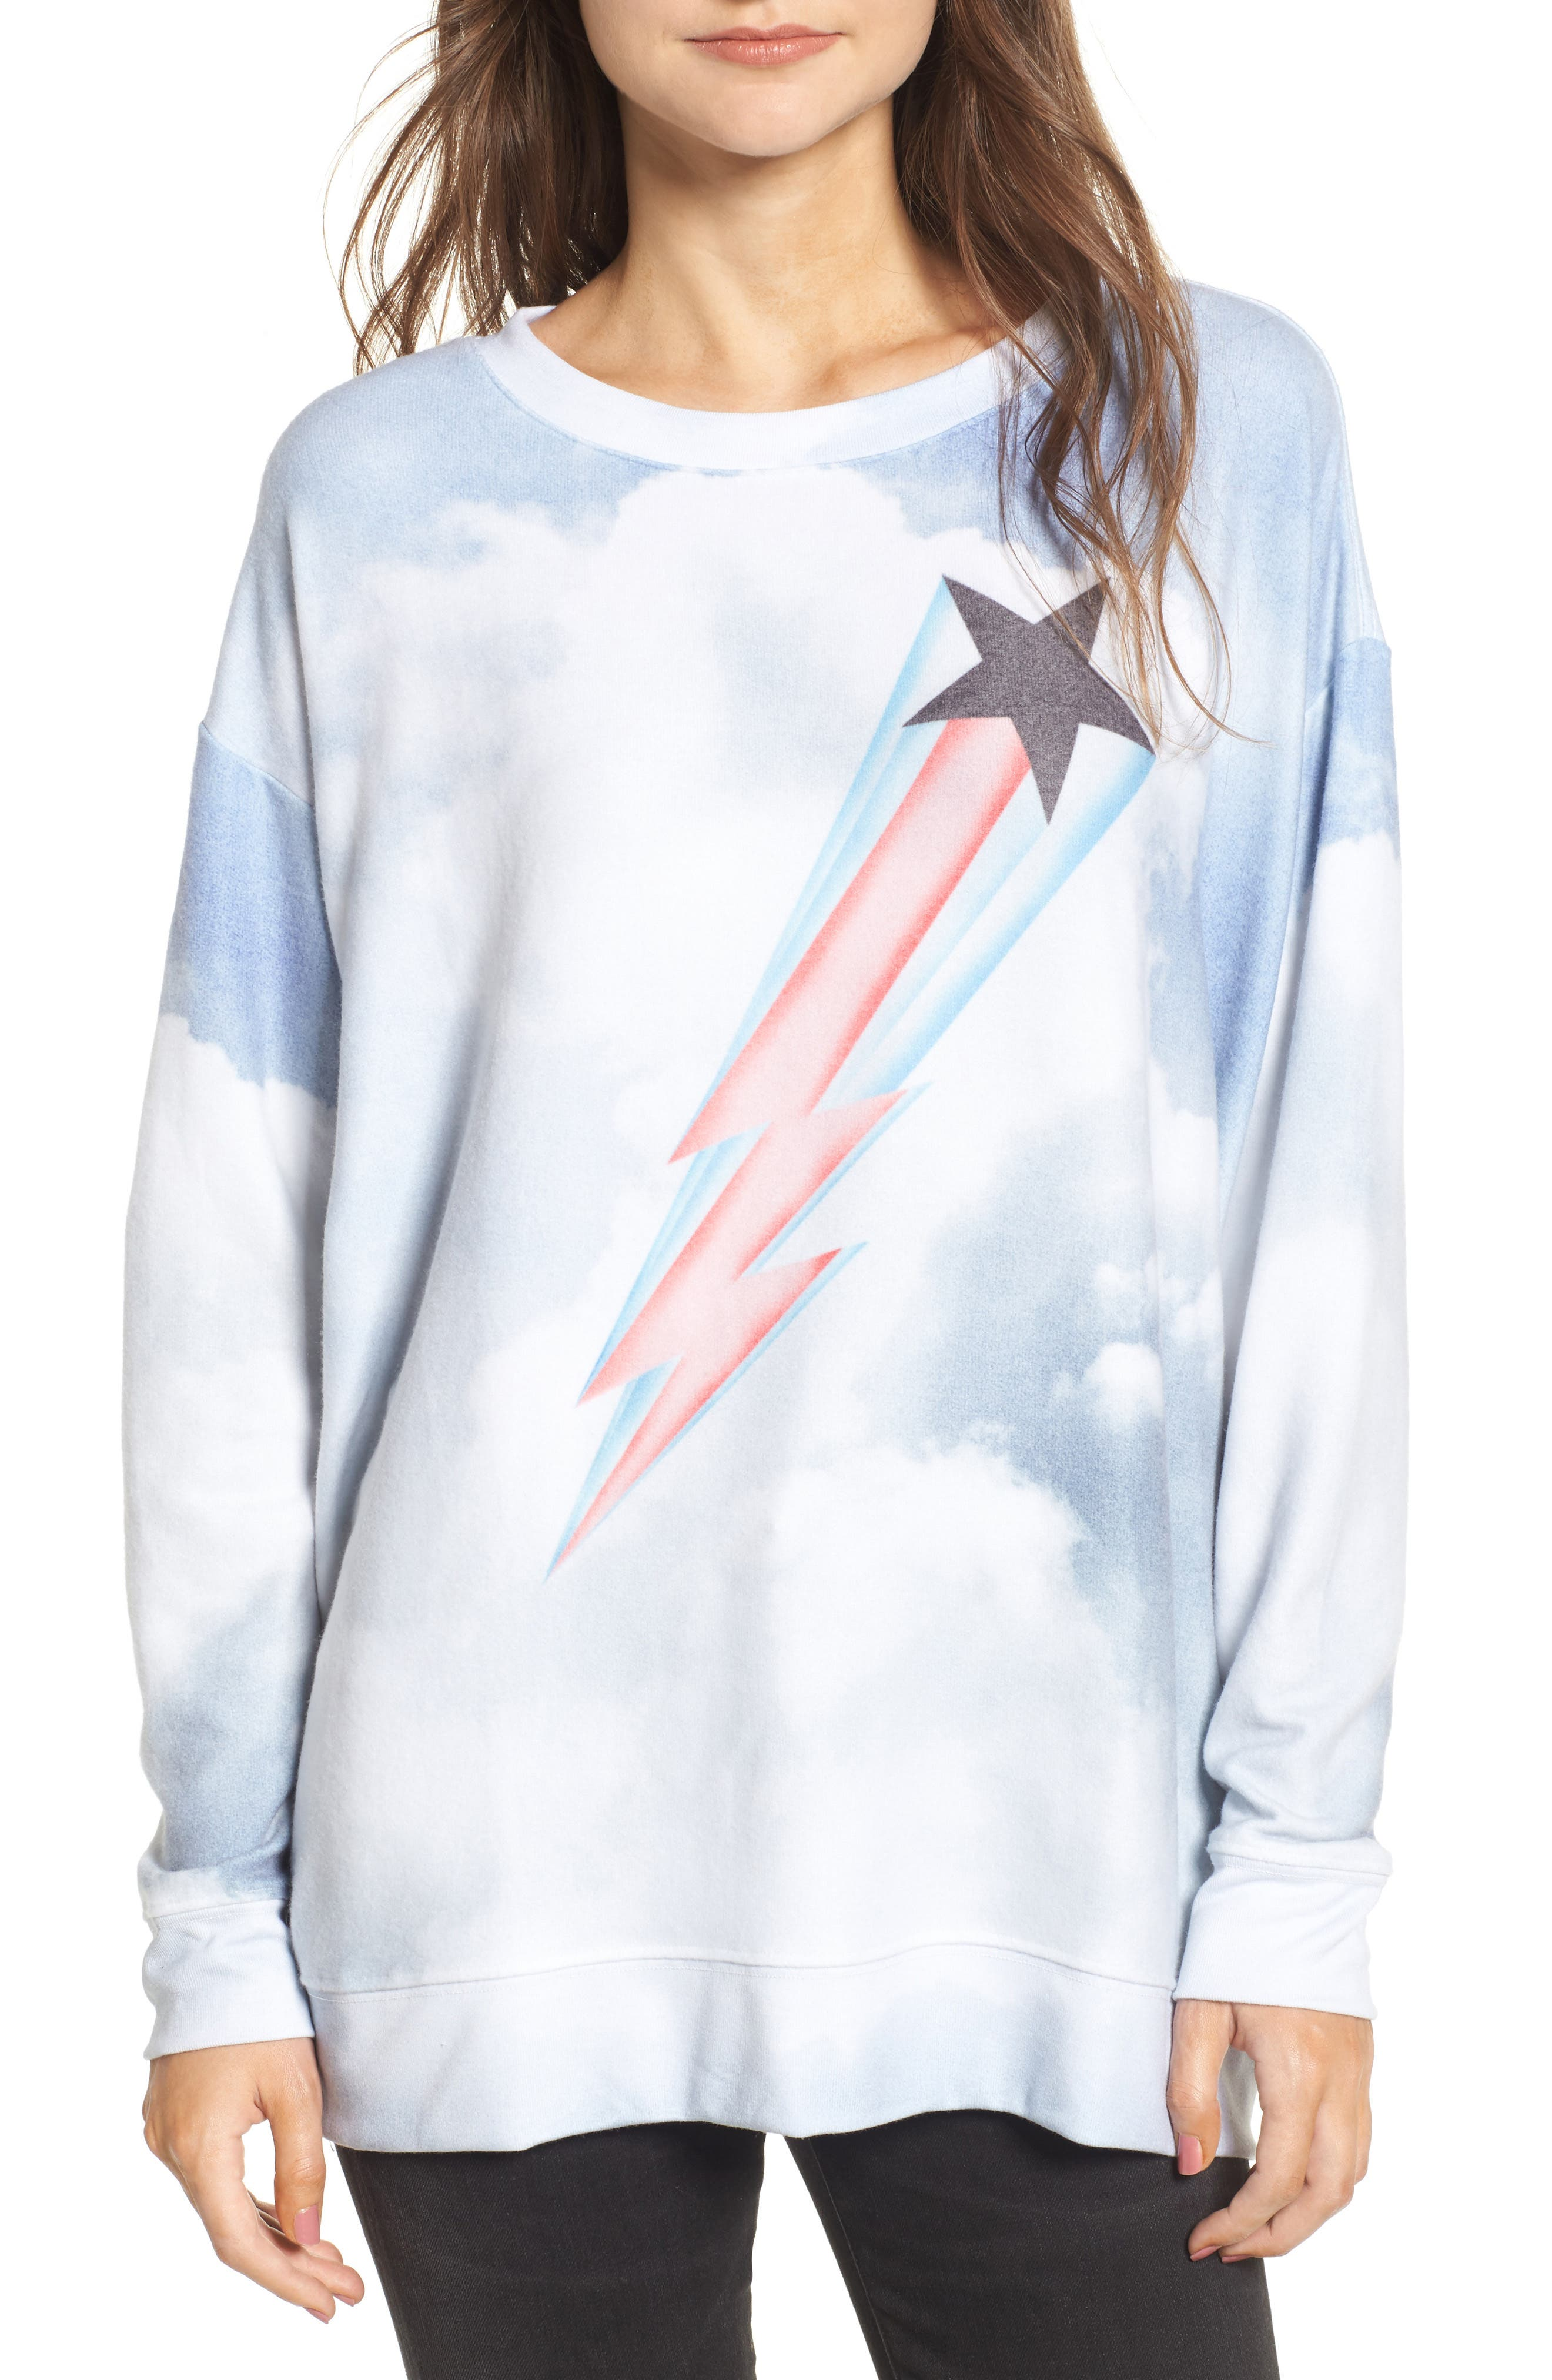 Heavens Roadtrip Sweatshirt,                         Main,                         color, Multi